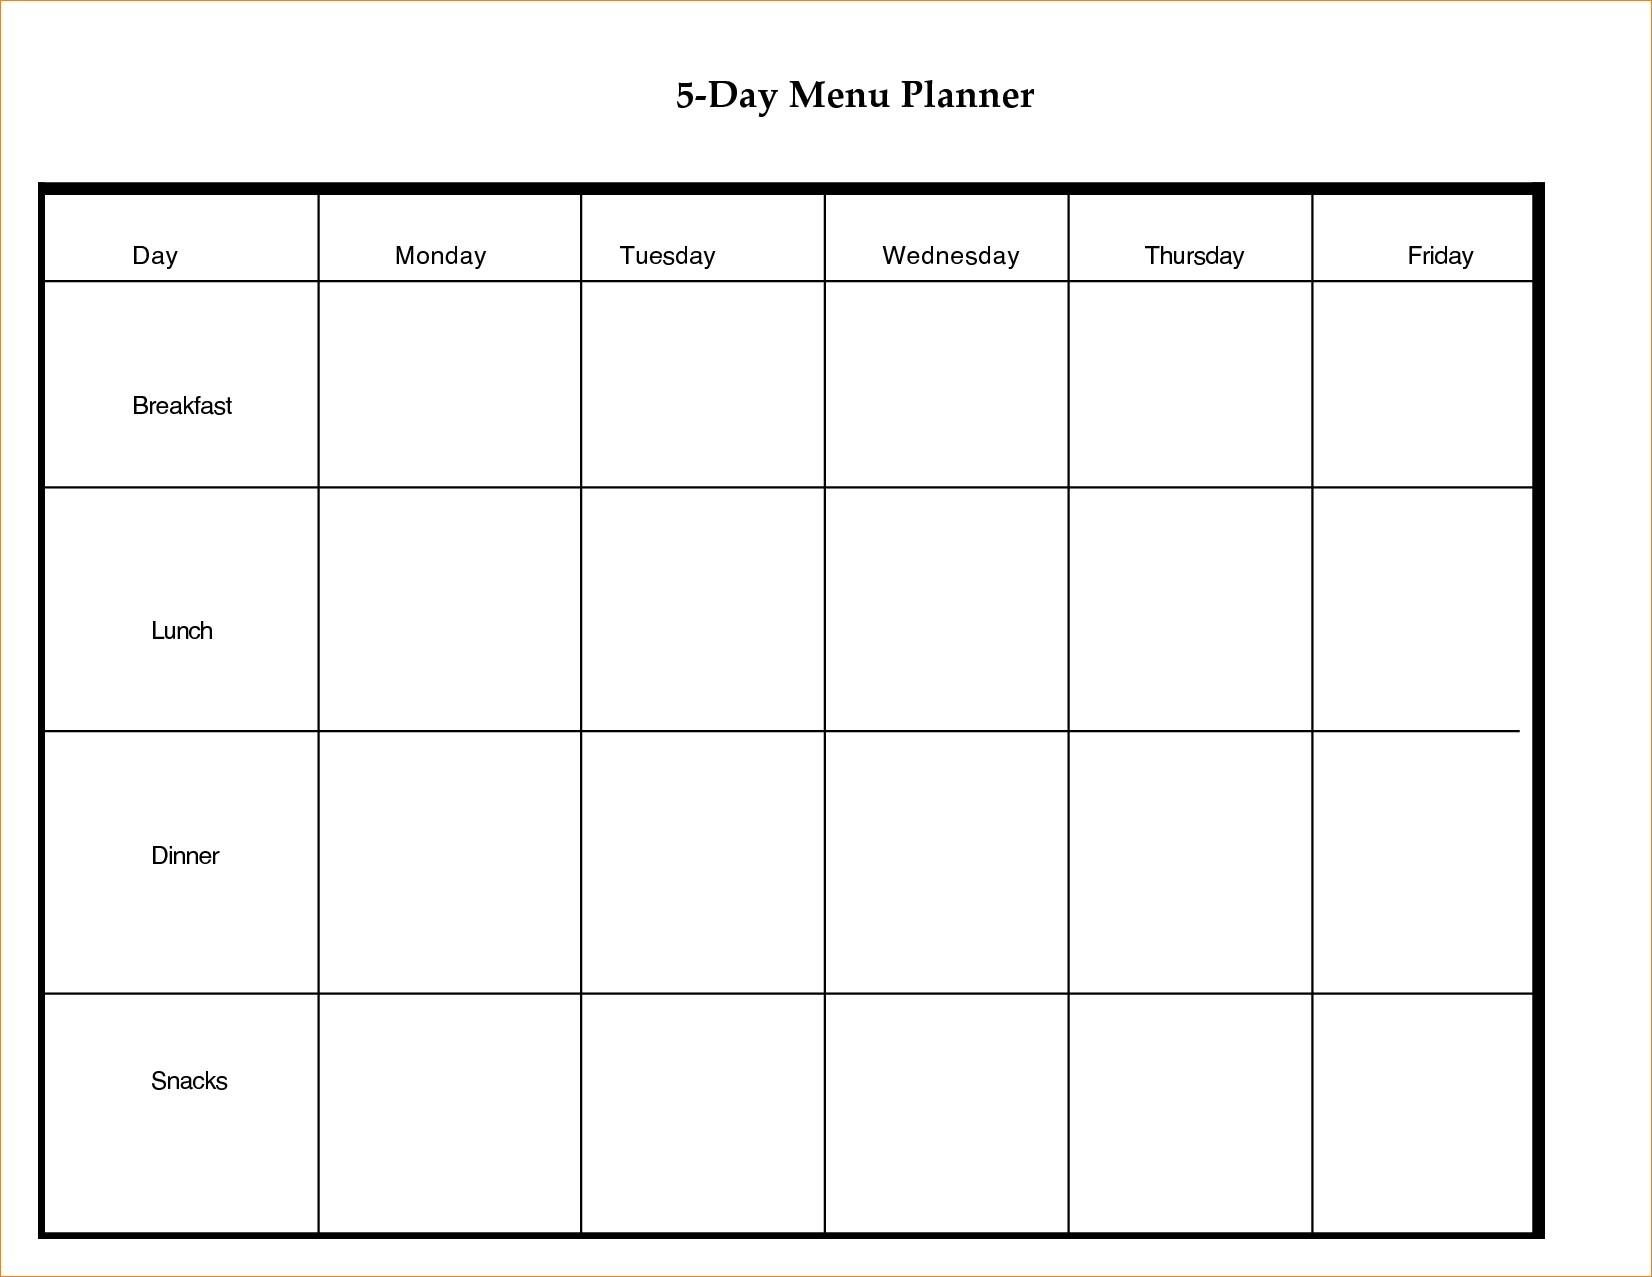 Printable 5 Day Calendar Blank Calendar Template 5 Day Week 0 8 With pertaining to 5 Day Week Blank Calendar Printable